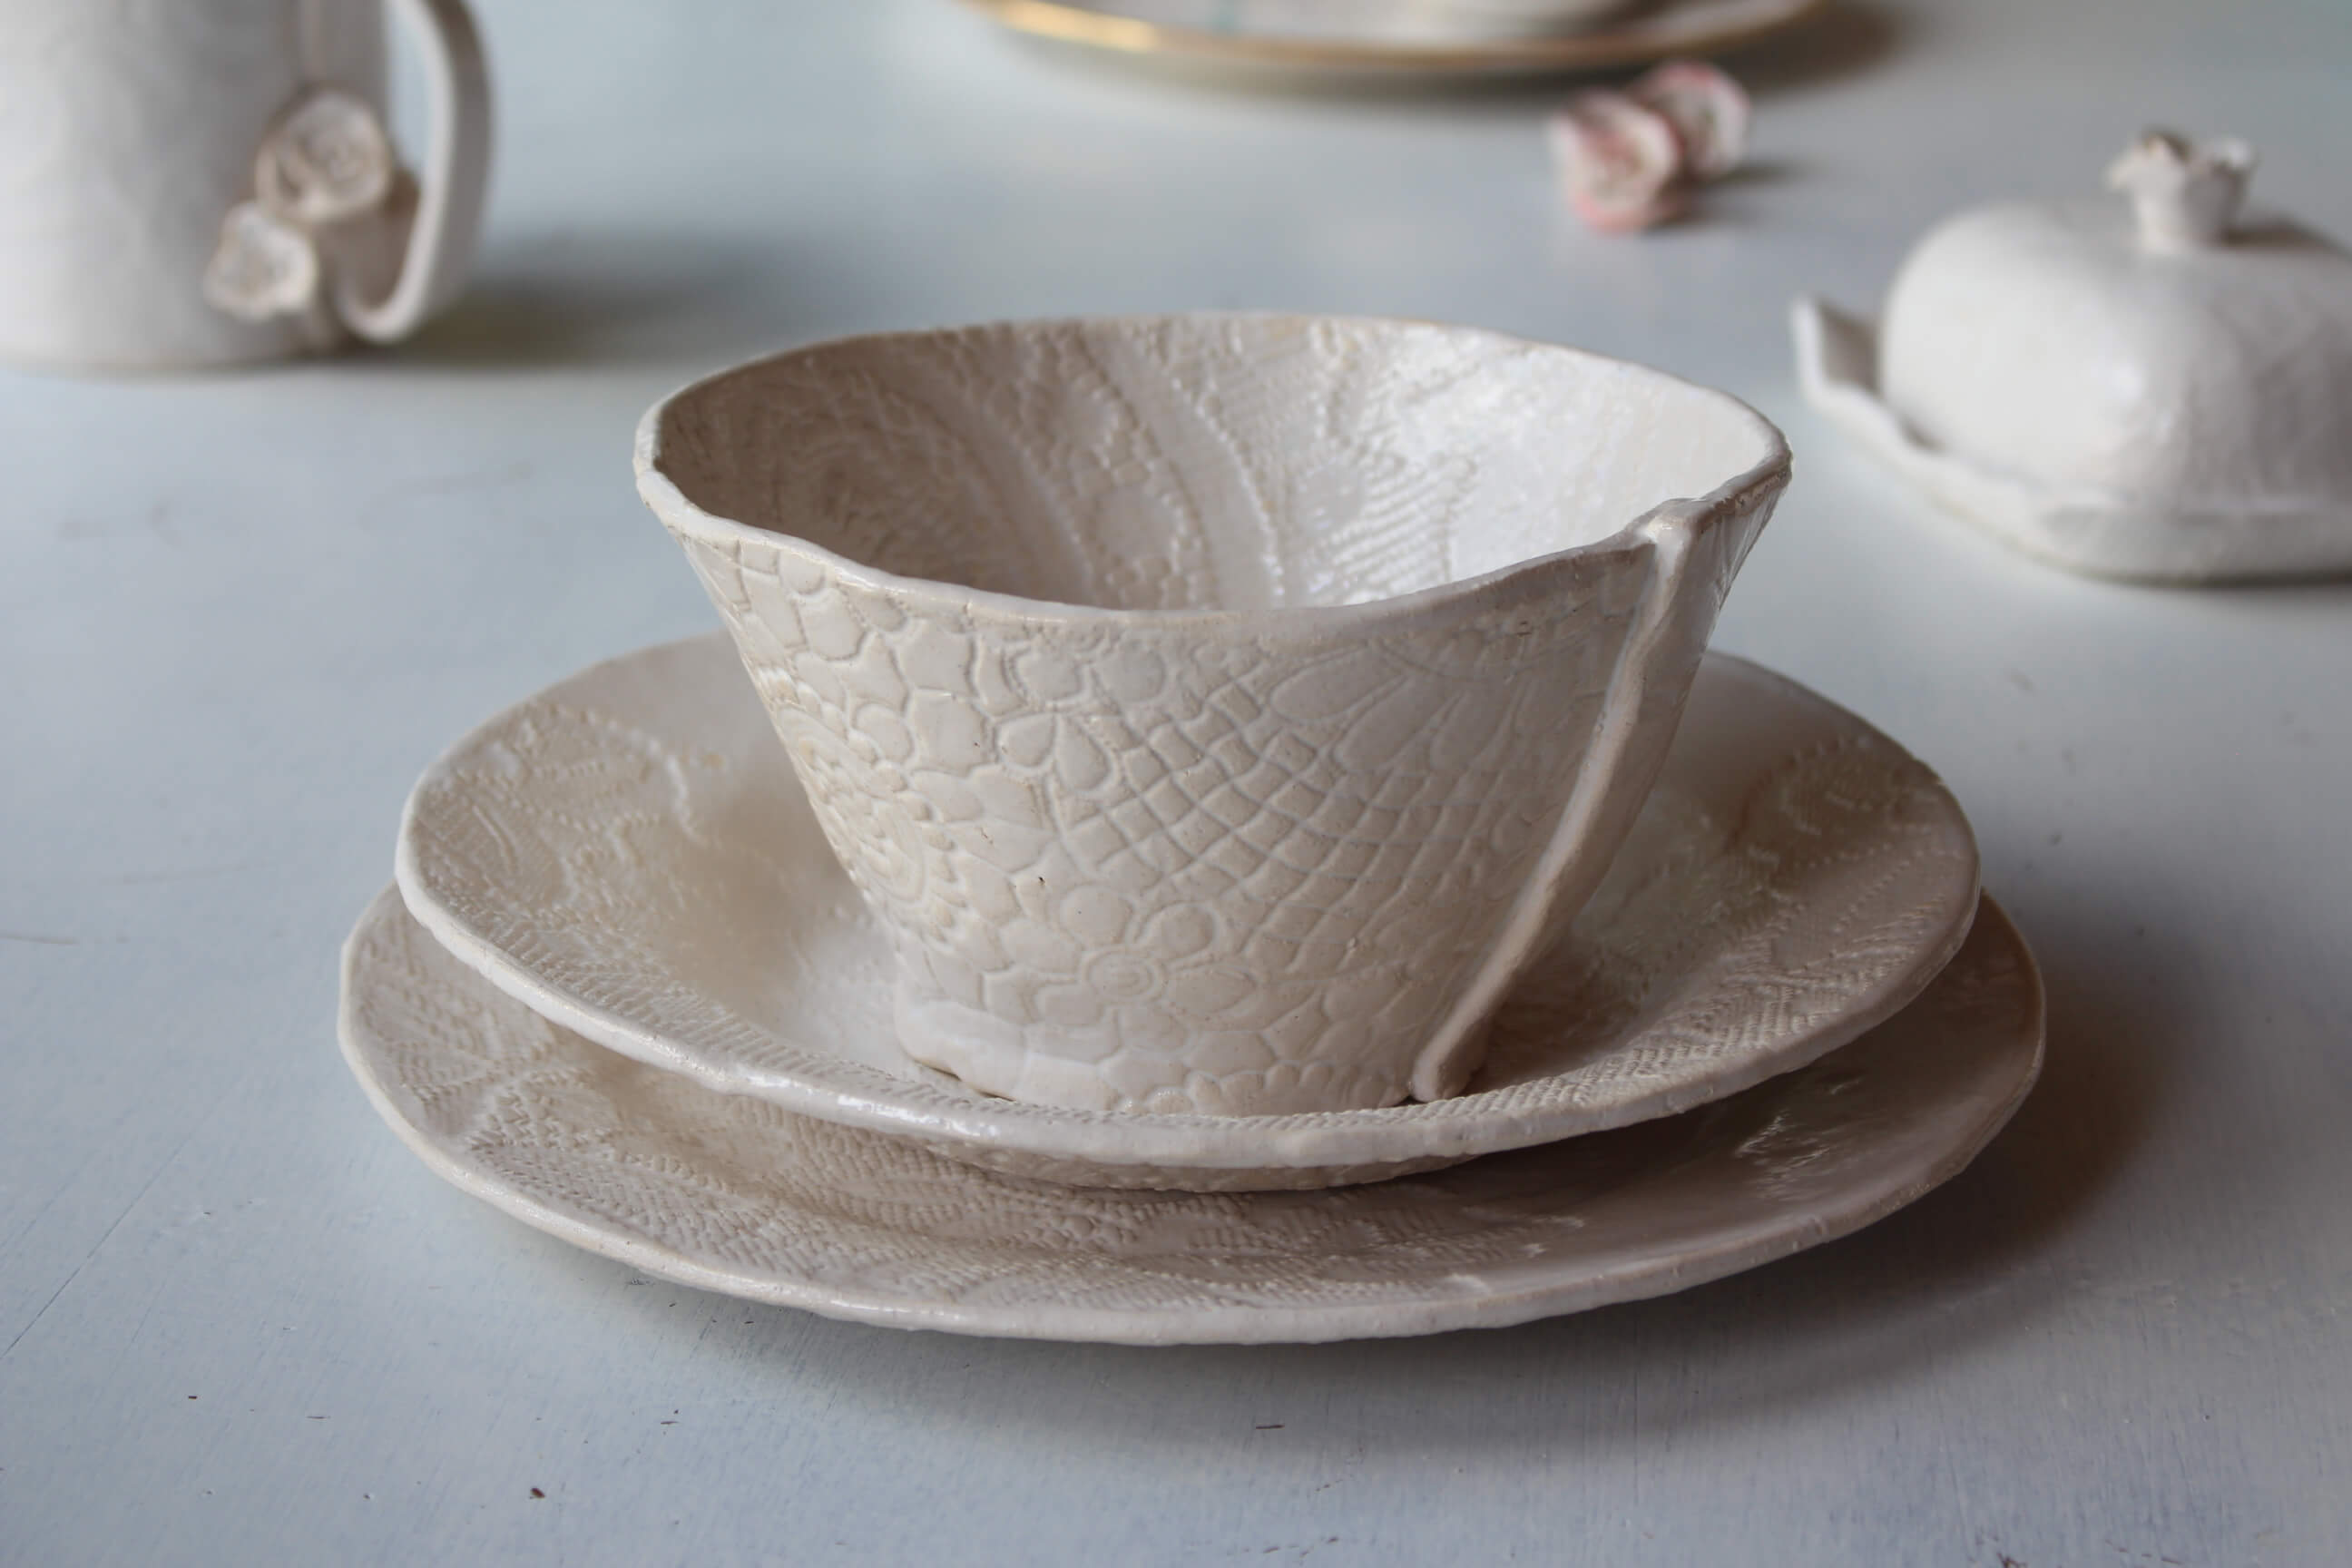 keramikblumen wildrosen 2 st ck keramik shop. Black Bedroom Furniture Sets. Home Design Ideas